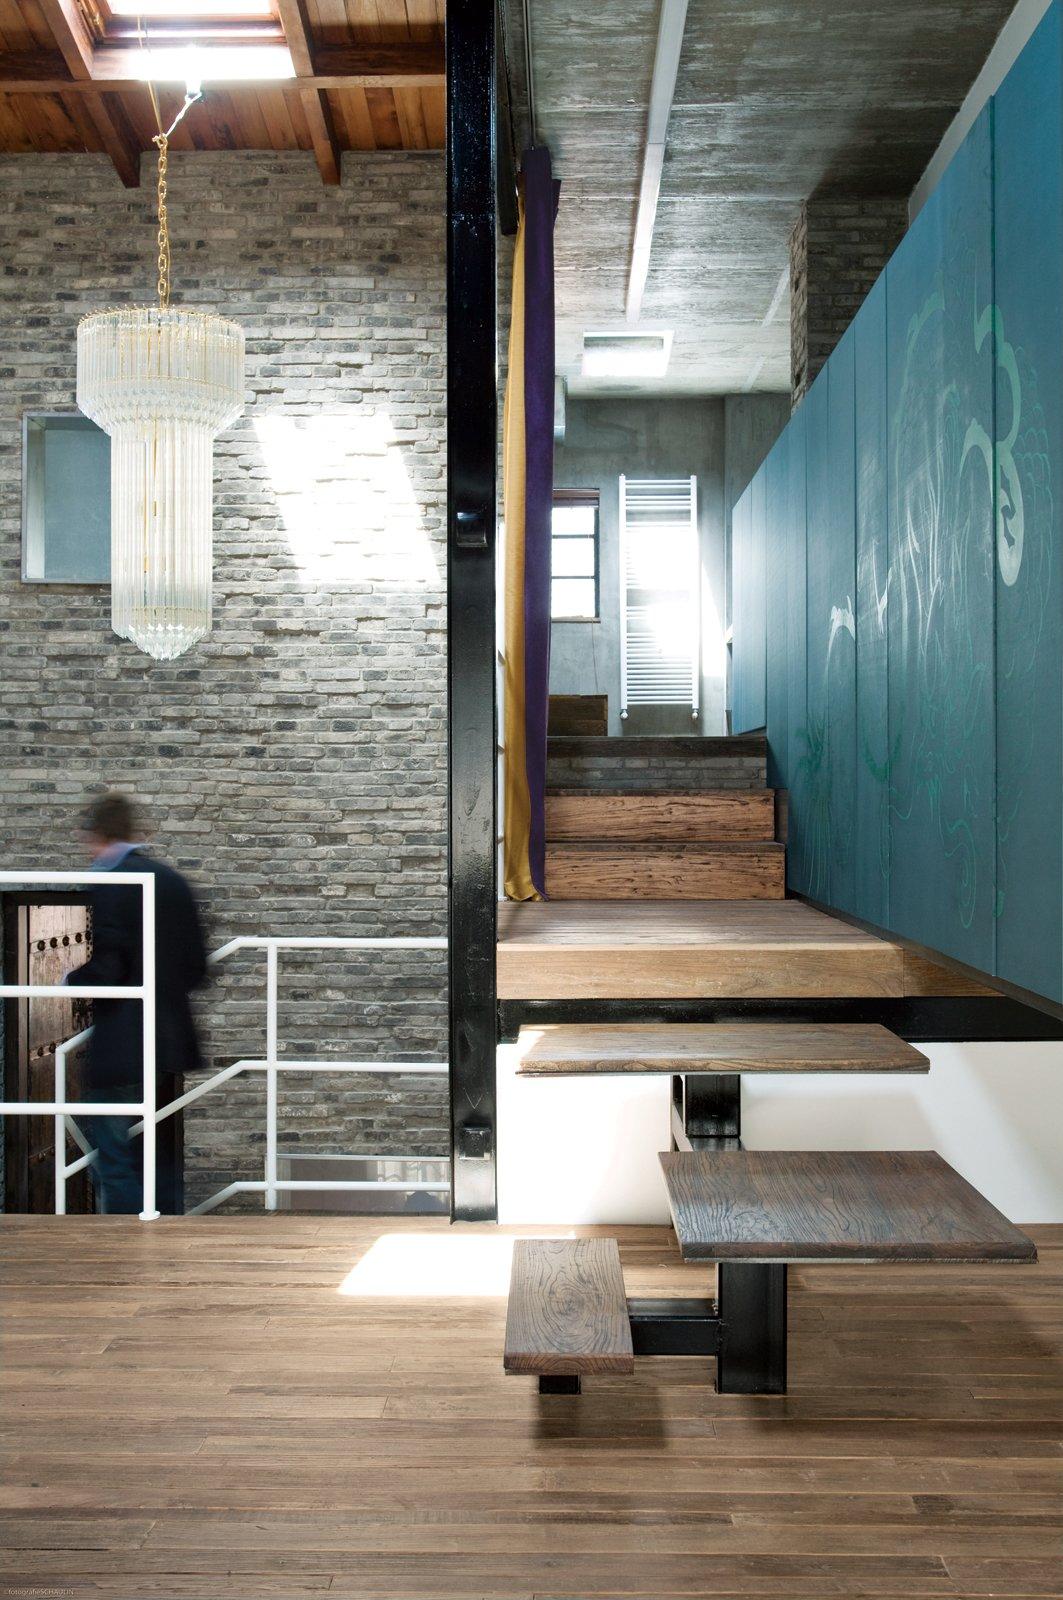 #lightingdesign #lighting #stairs #chandelier #Shanghai #China #EdoardoAllegranti #interior #indoor #inside #teal #brick #modern #traditional #wood   60+ Modern Lighting Solutions by Dwell